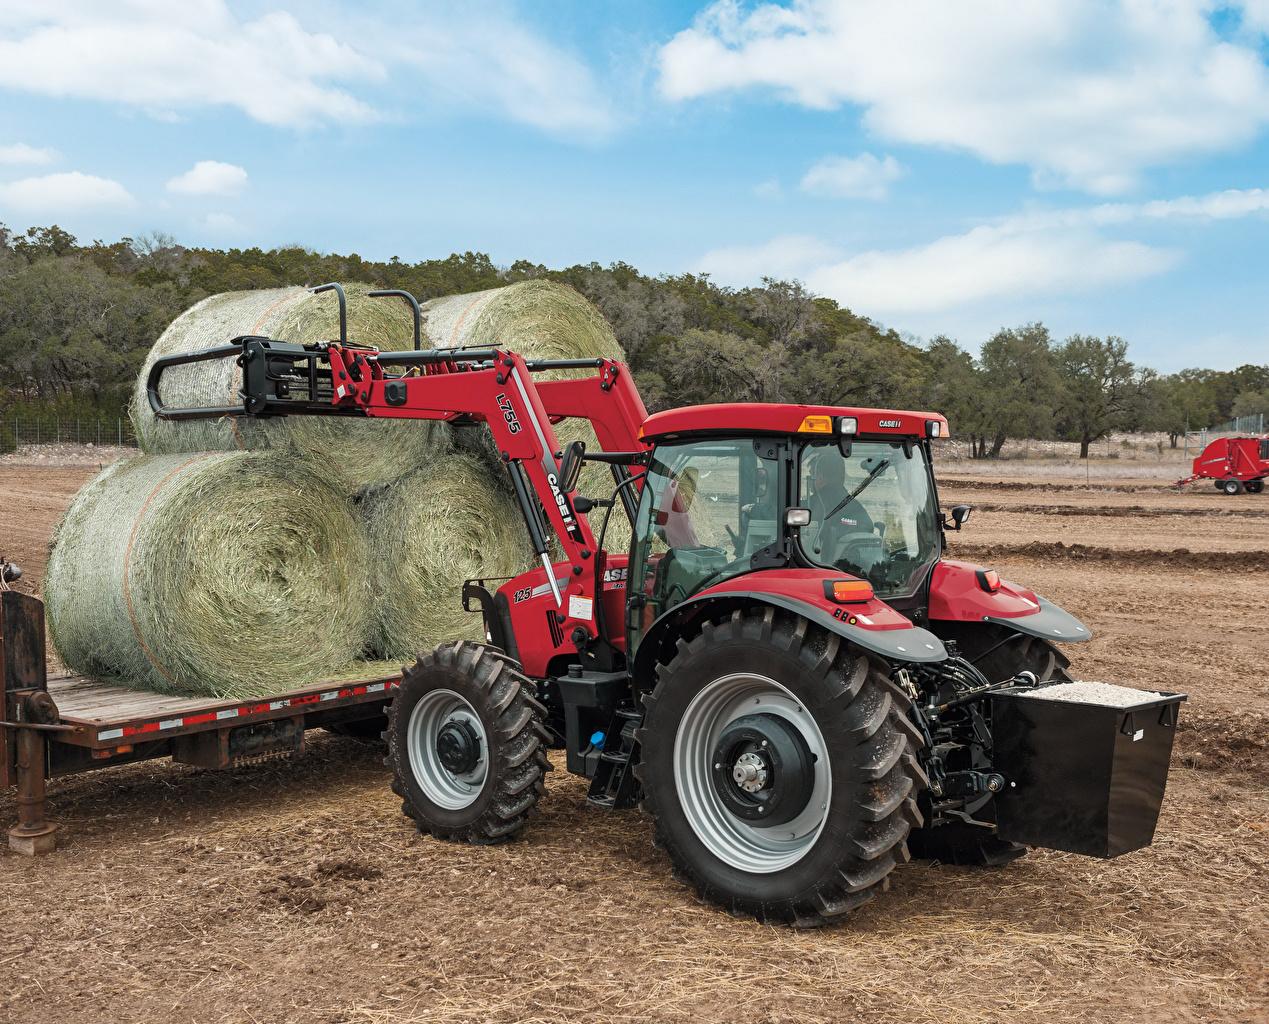 Afbeeldingen Landbouwwerktuig tractoren 2009-15 Case IH Maxxum 125 Akkerland Hooi landbouwmachine Tractor akker agrarische velden